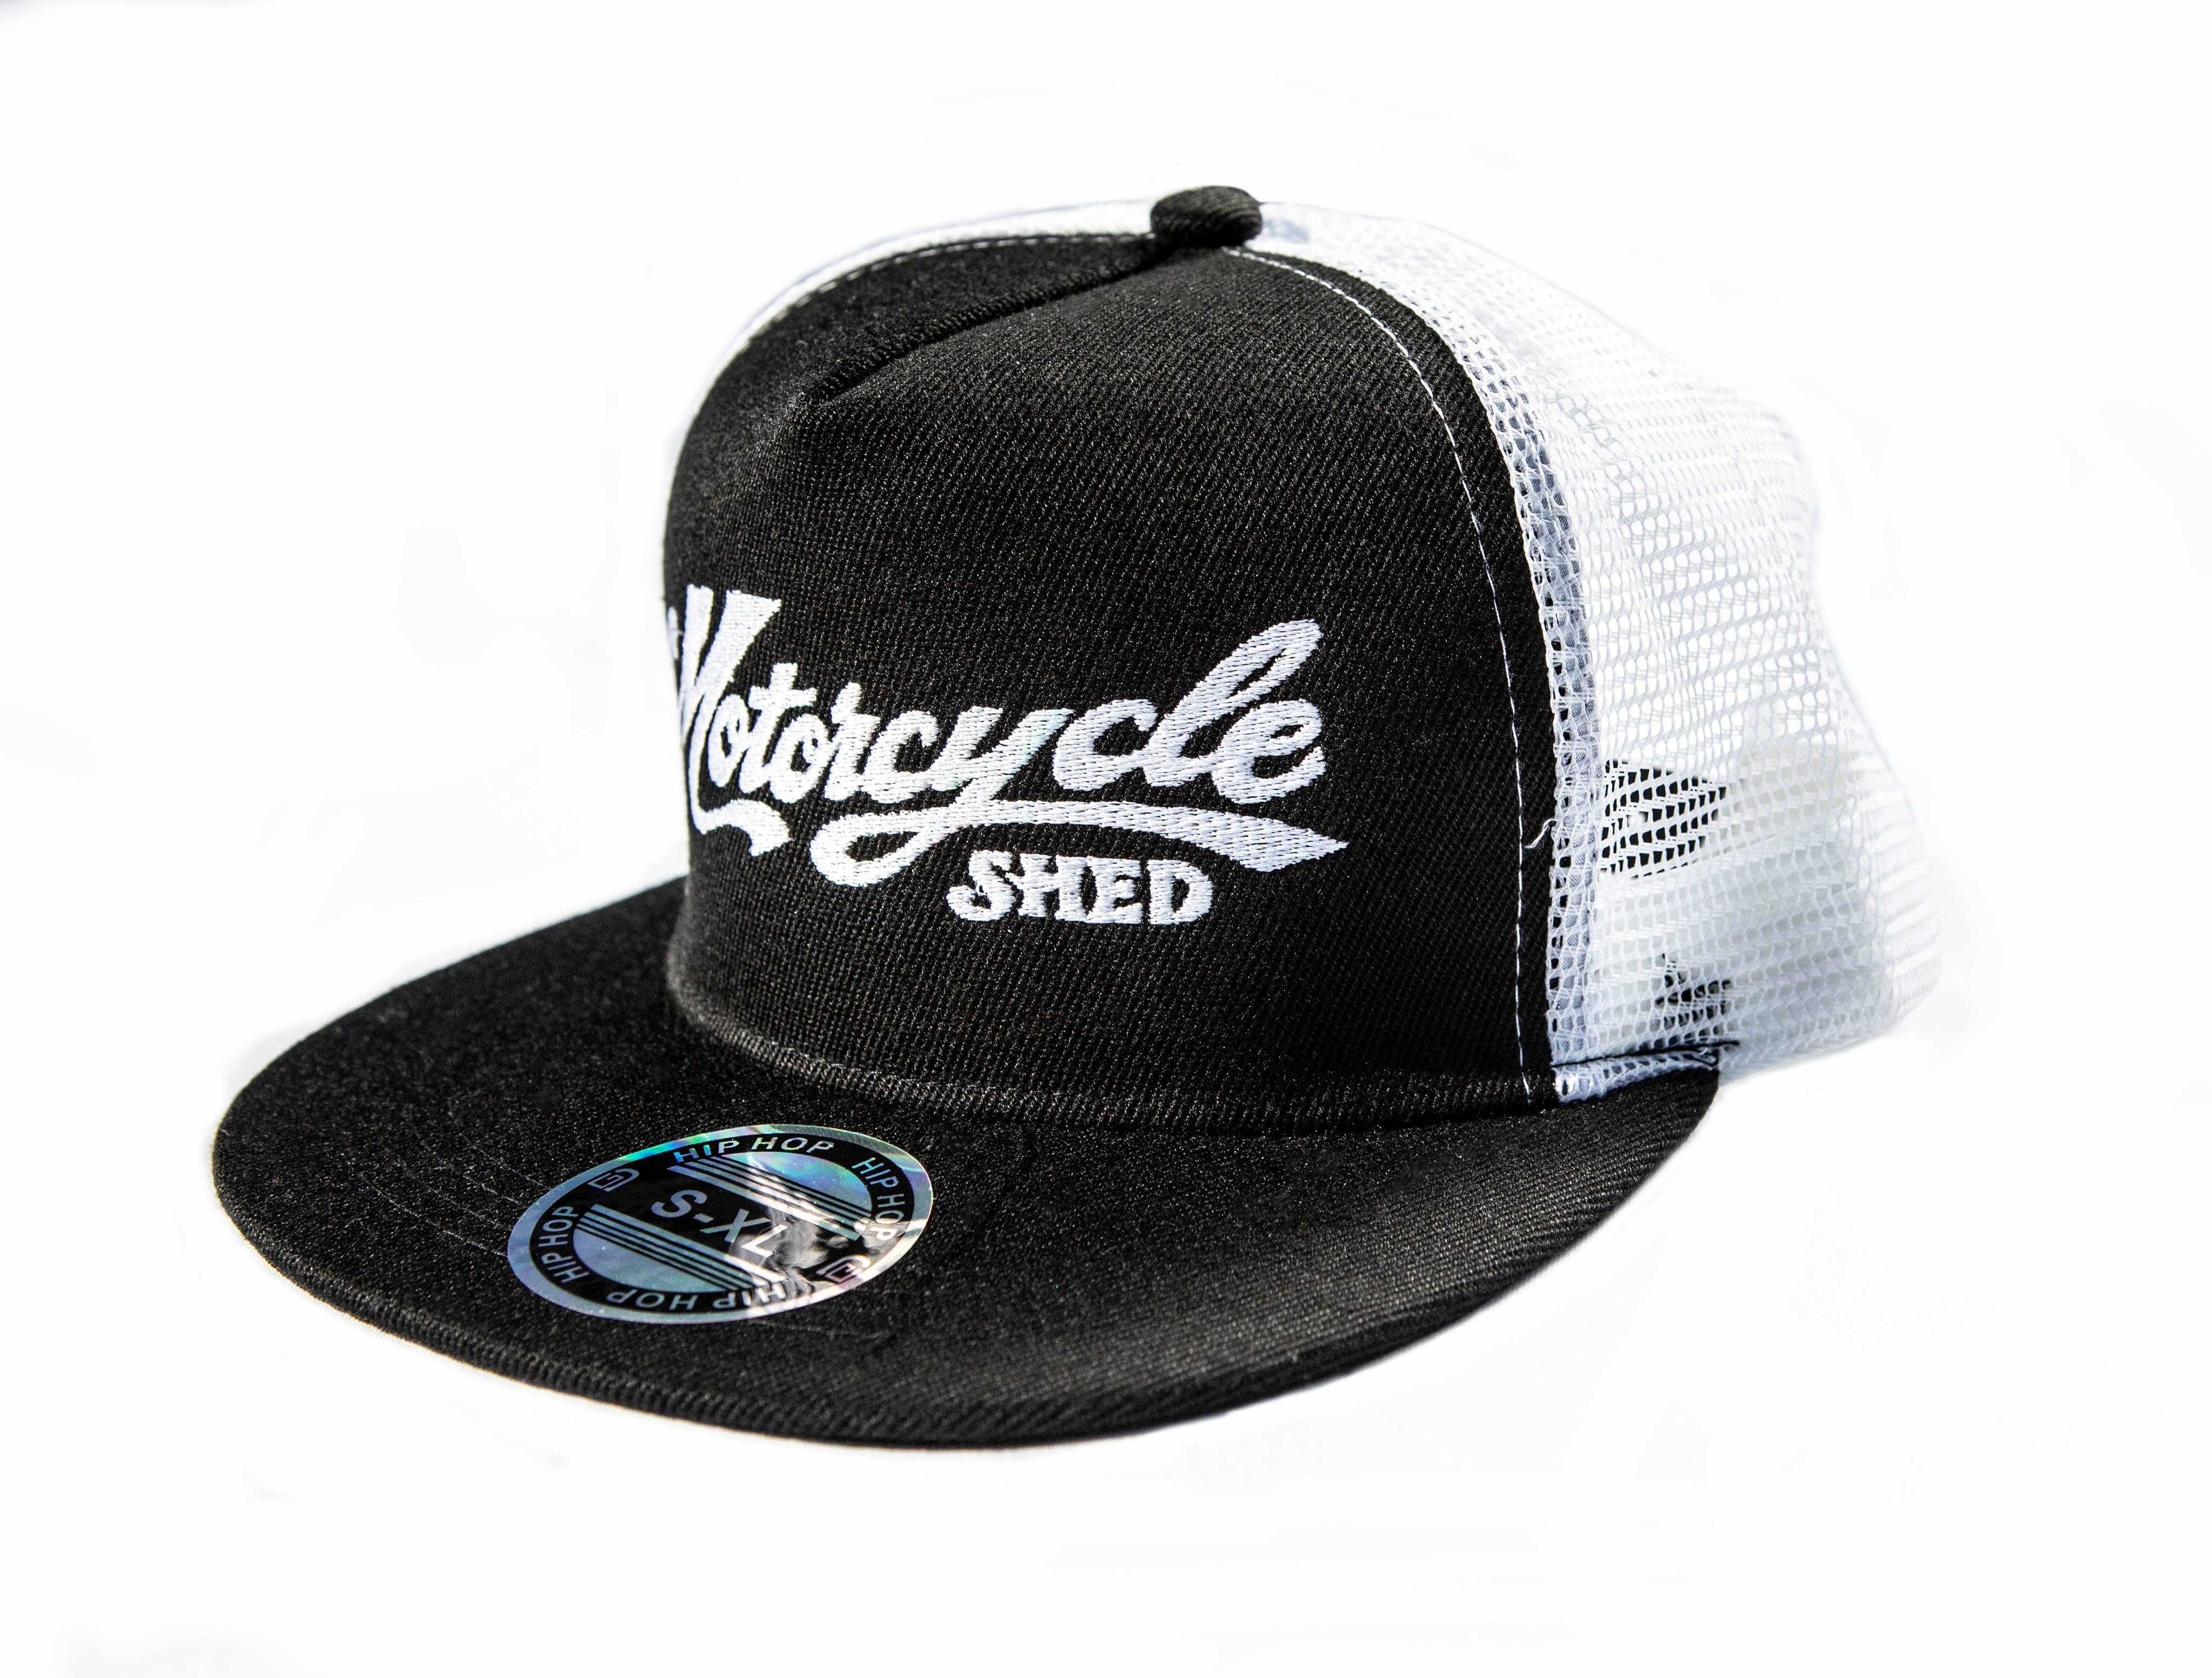 Motorcycle Shed Flat Cap - Mesh Back